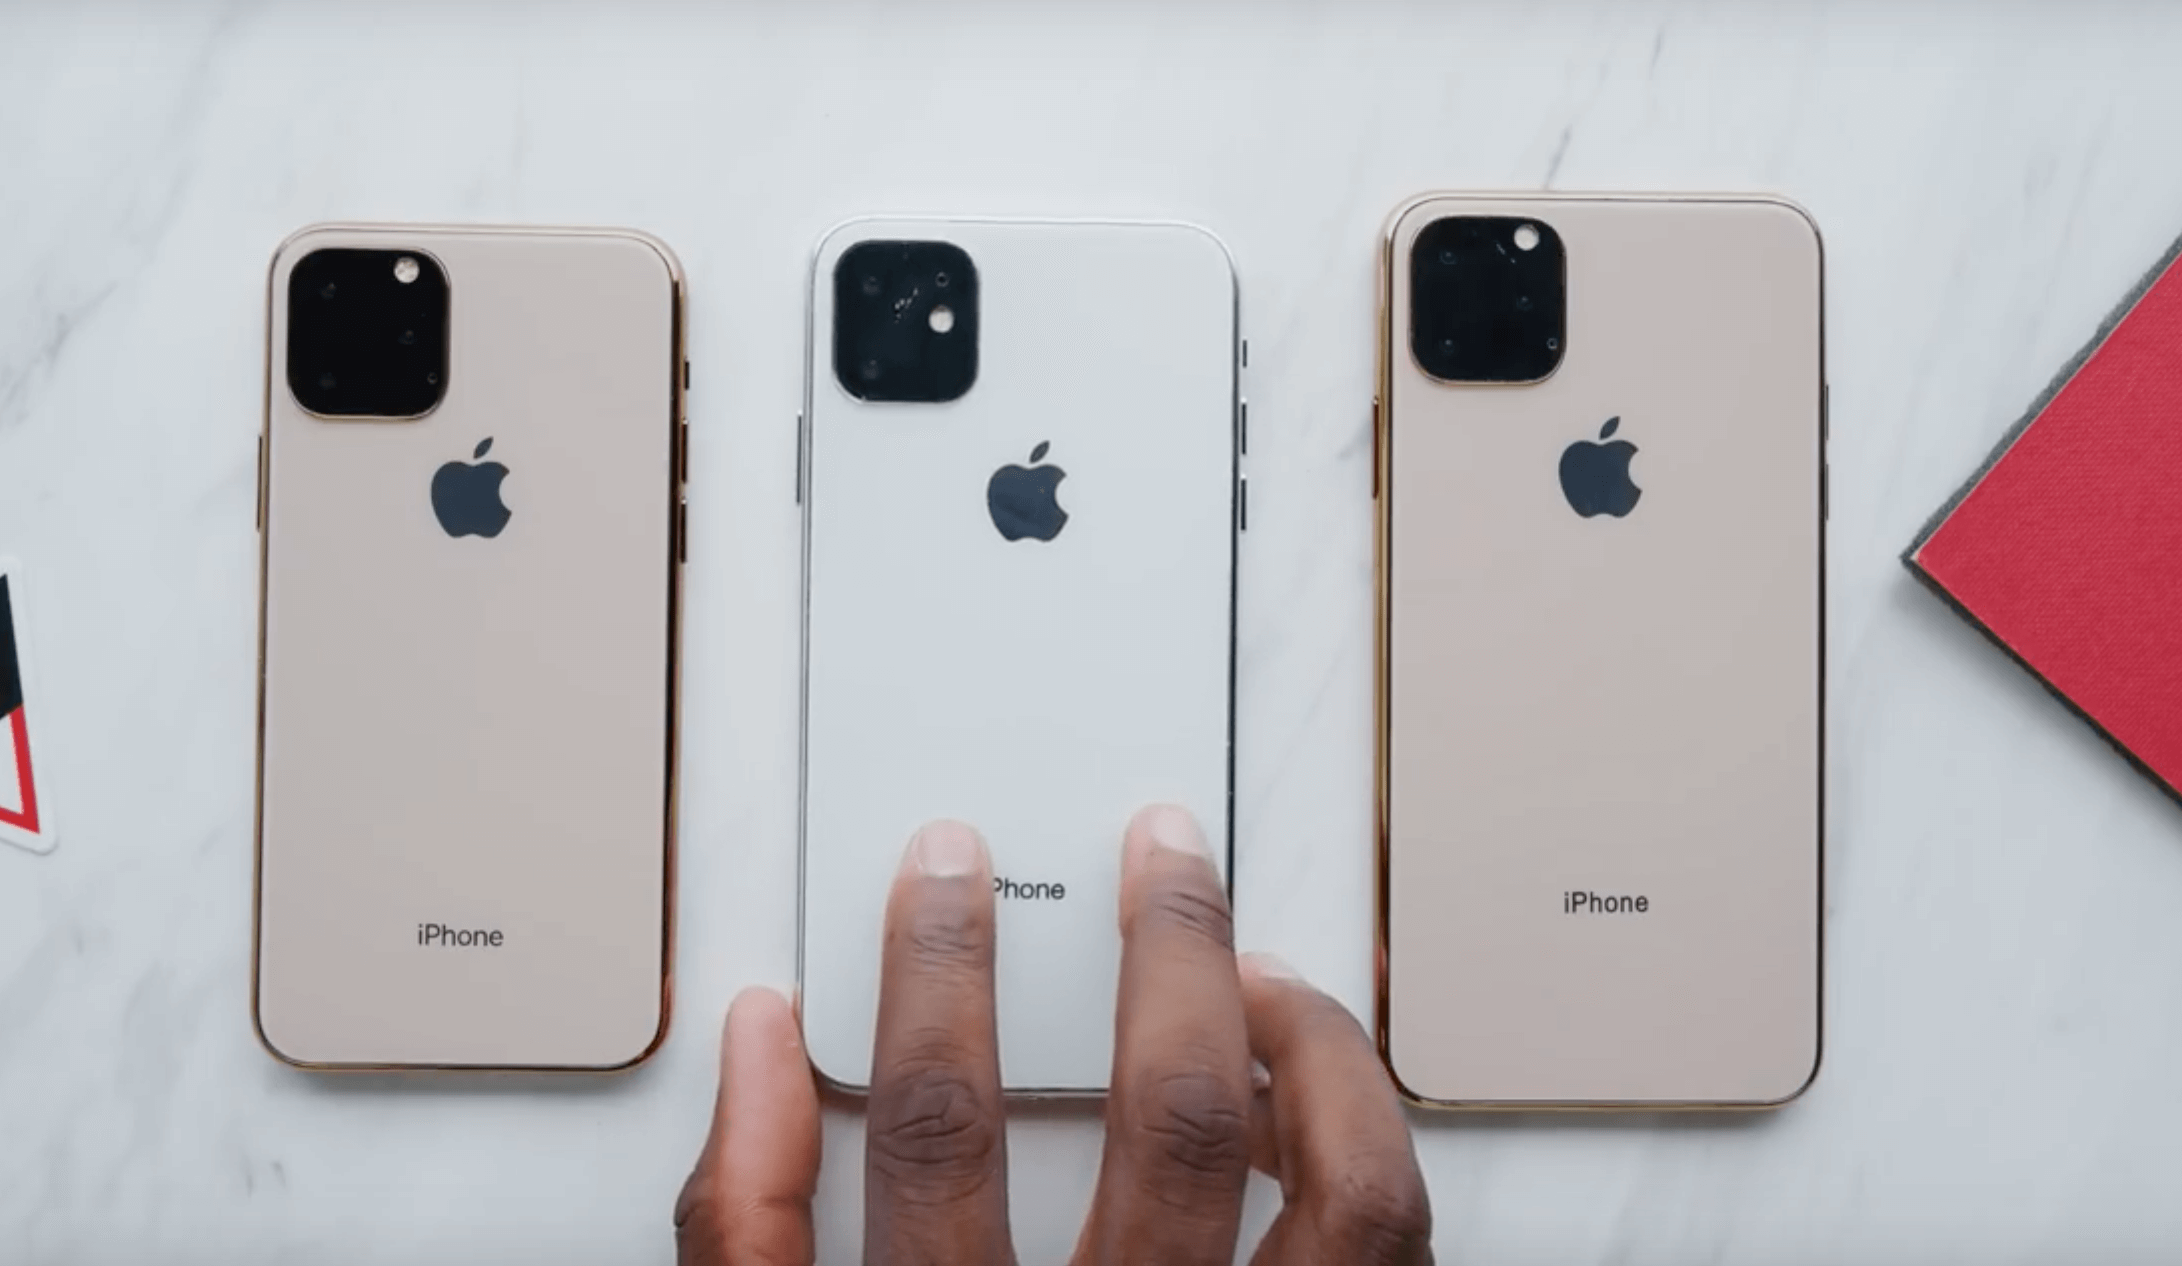 iPhone 11 Pro kommt mit den OLED-Panels des Galaxy S10 / Note 10